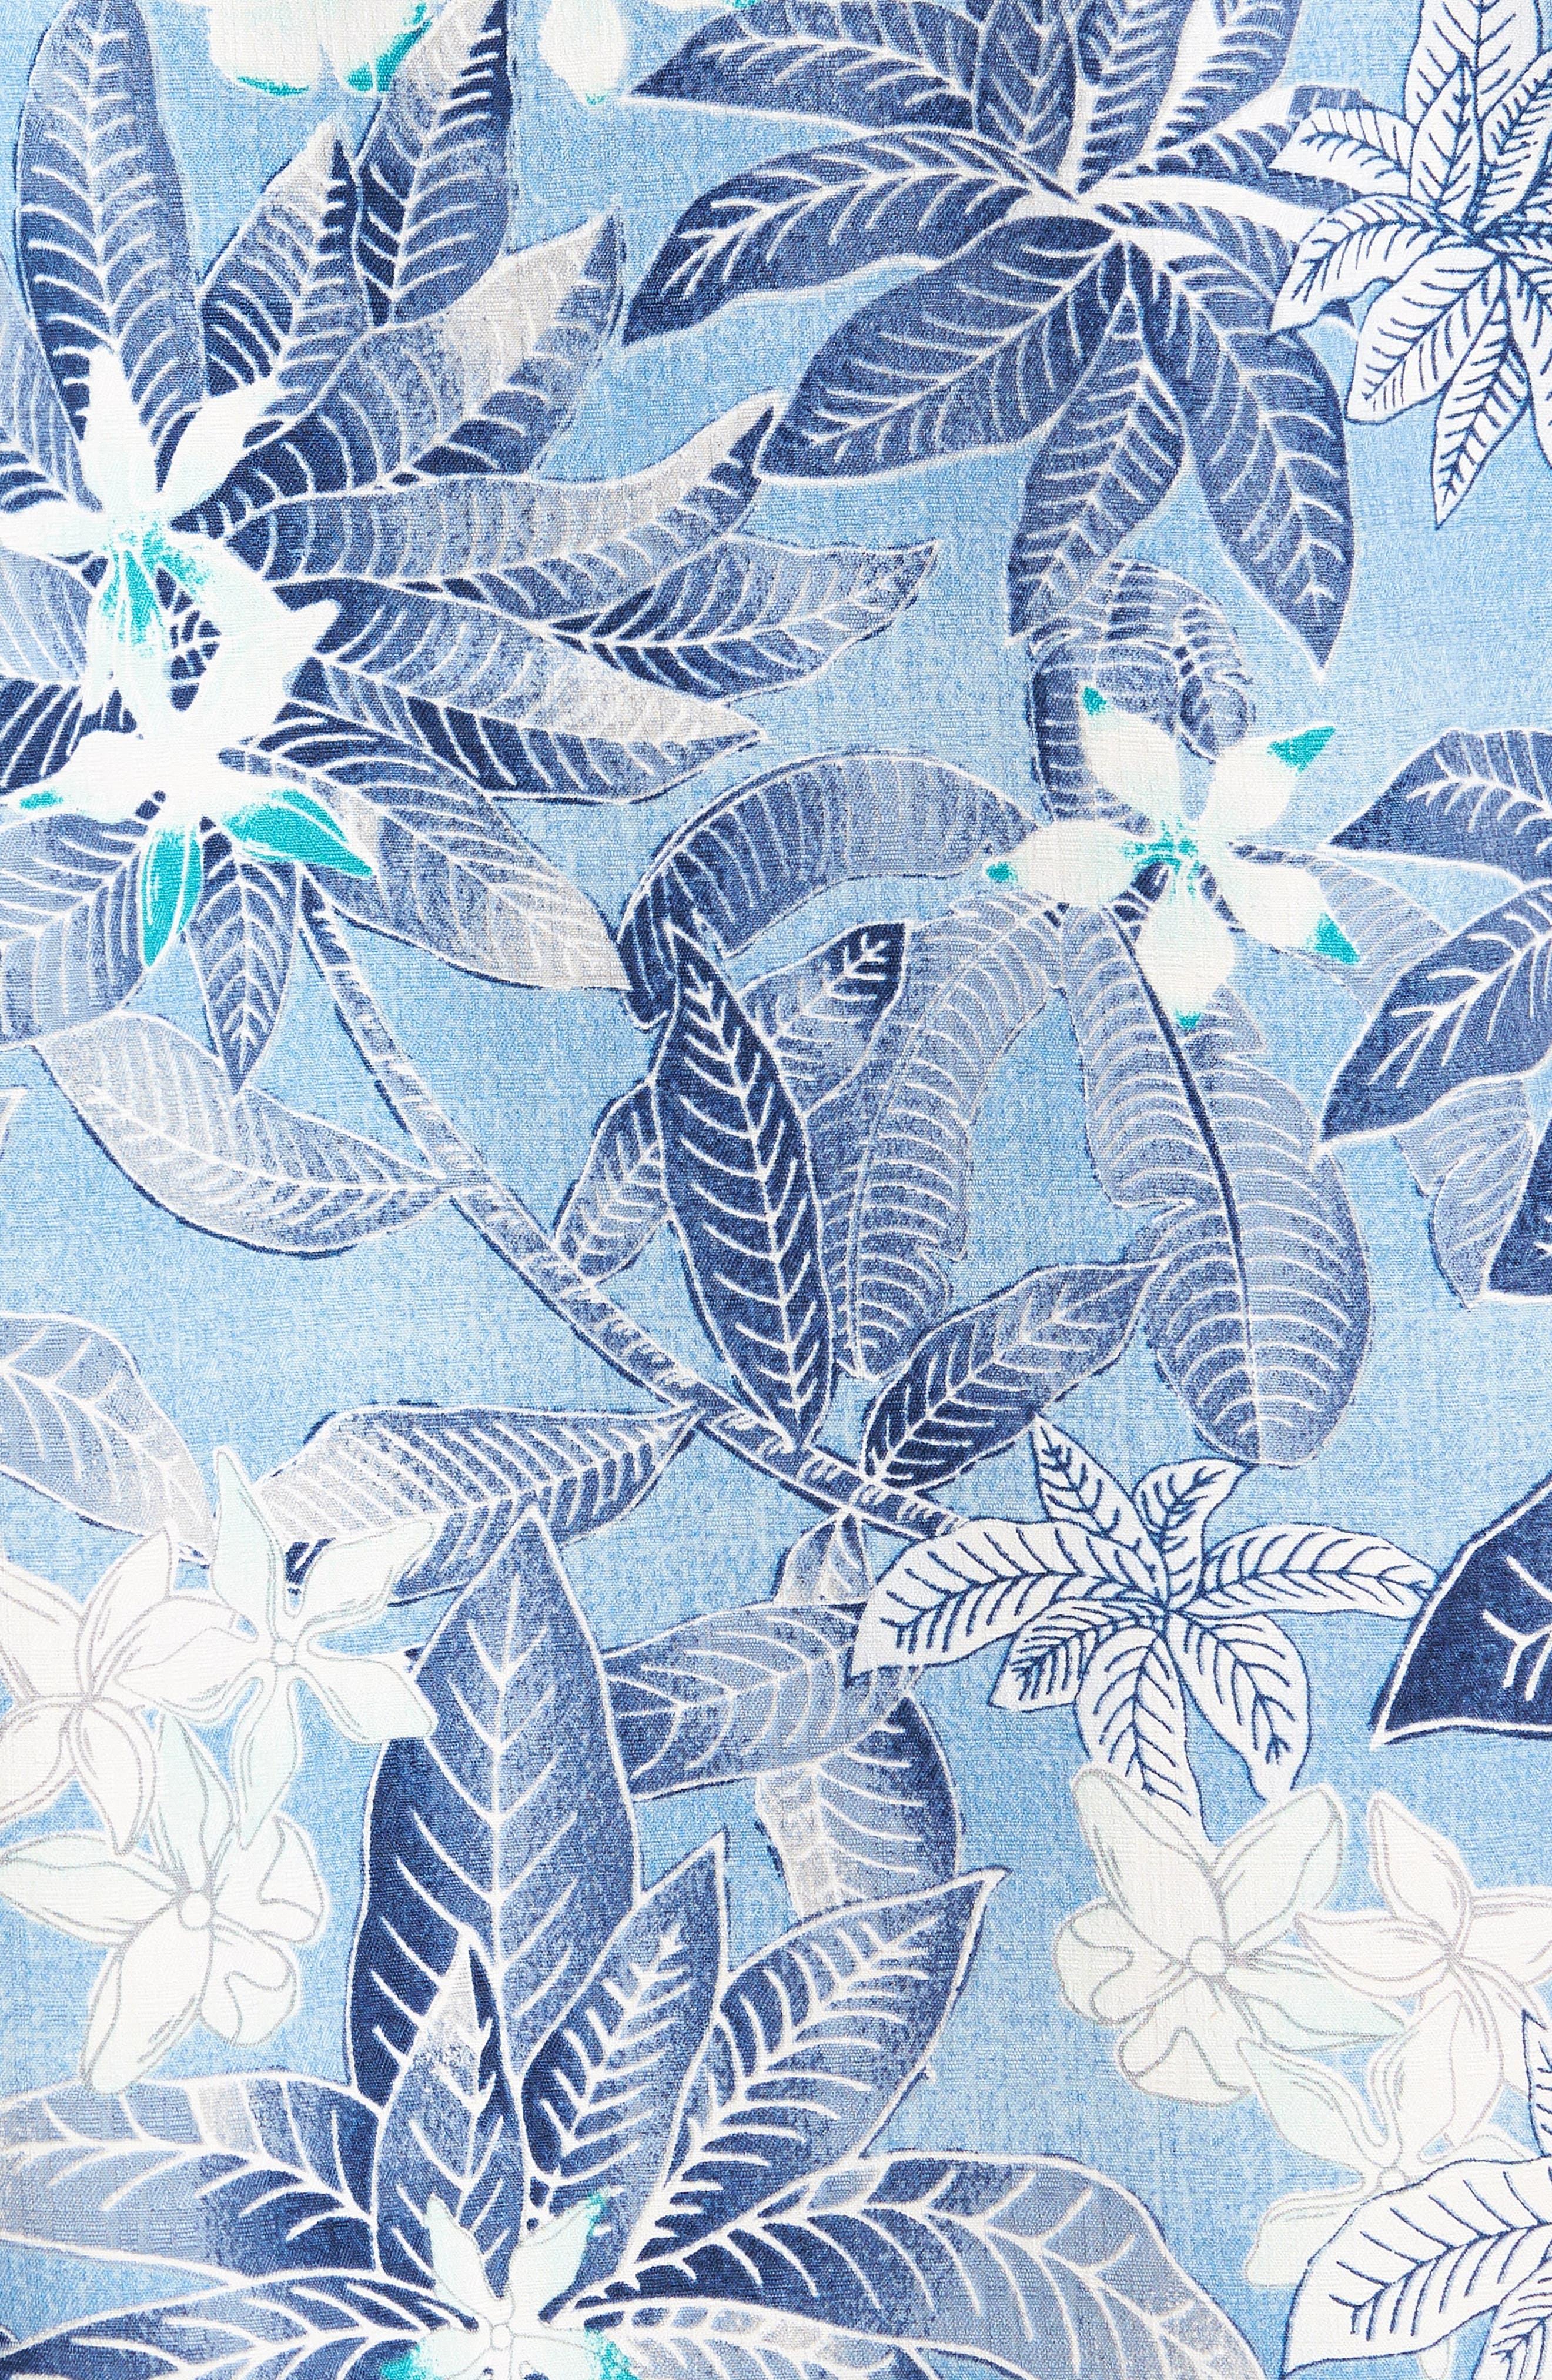 El Medano Jungle Silk Camp Shirt,                             Alternate thumbnail 5, color,                             Blue Aster